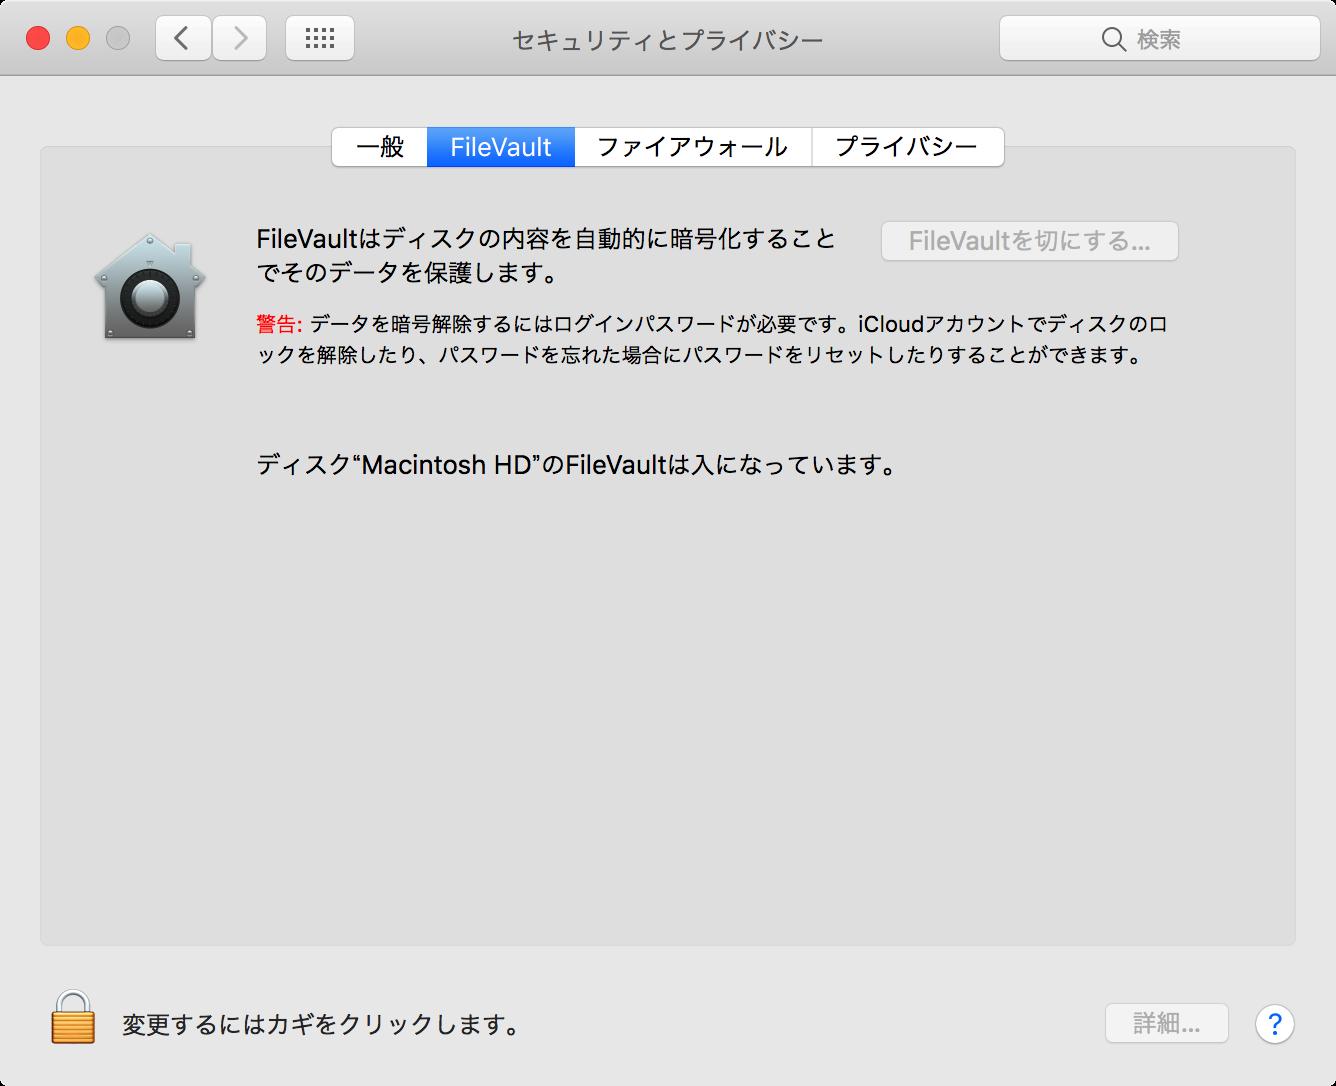 FileVault Security